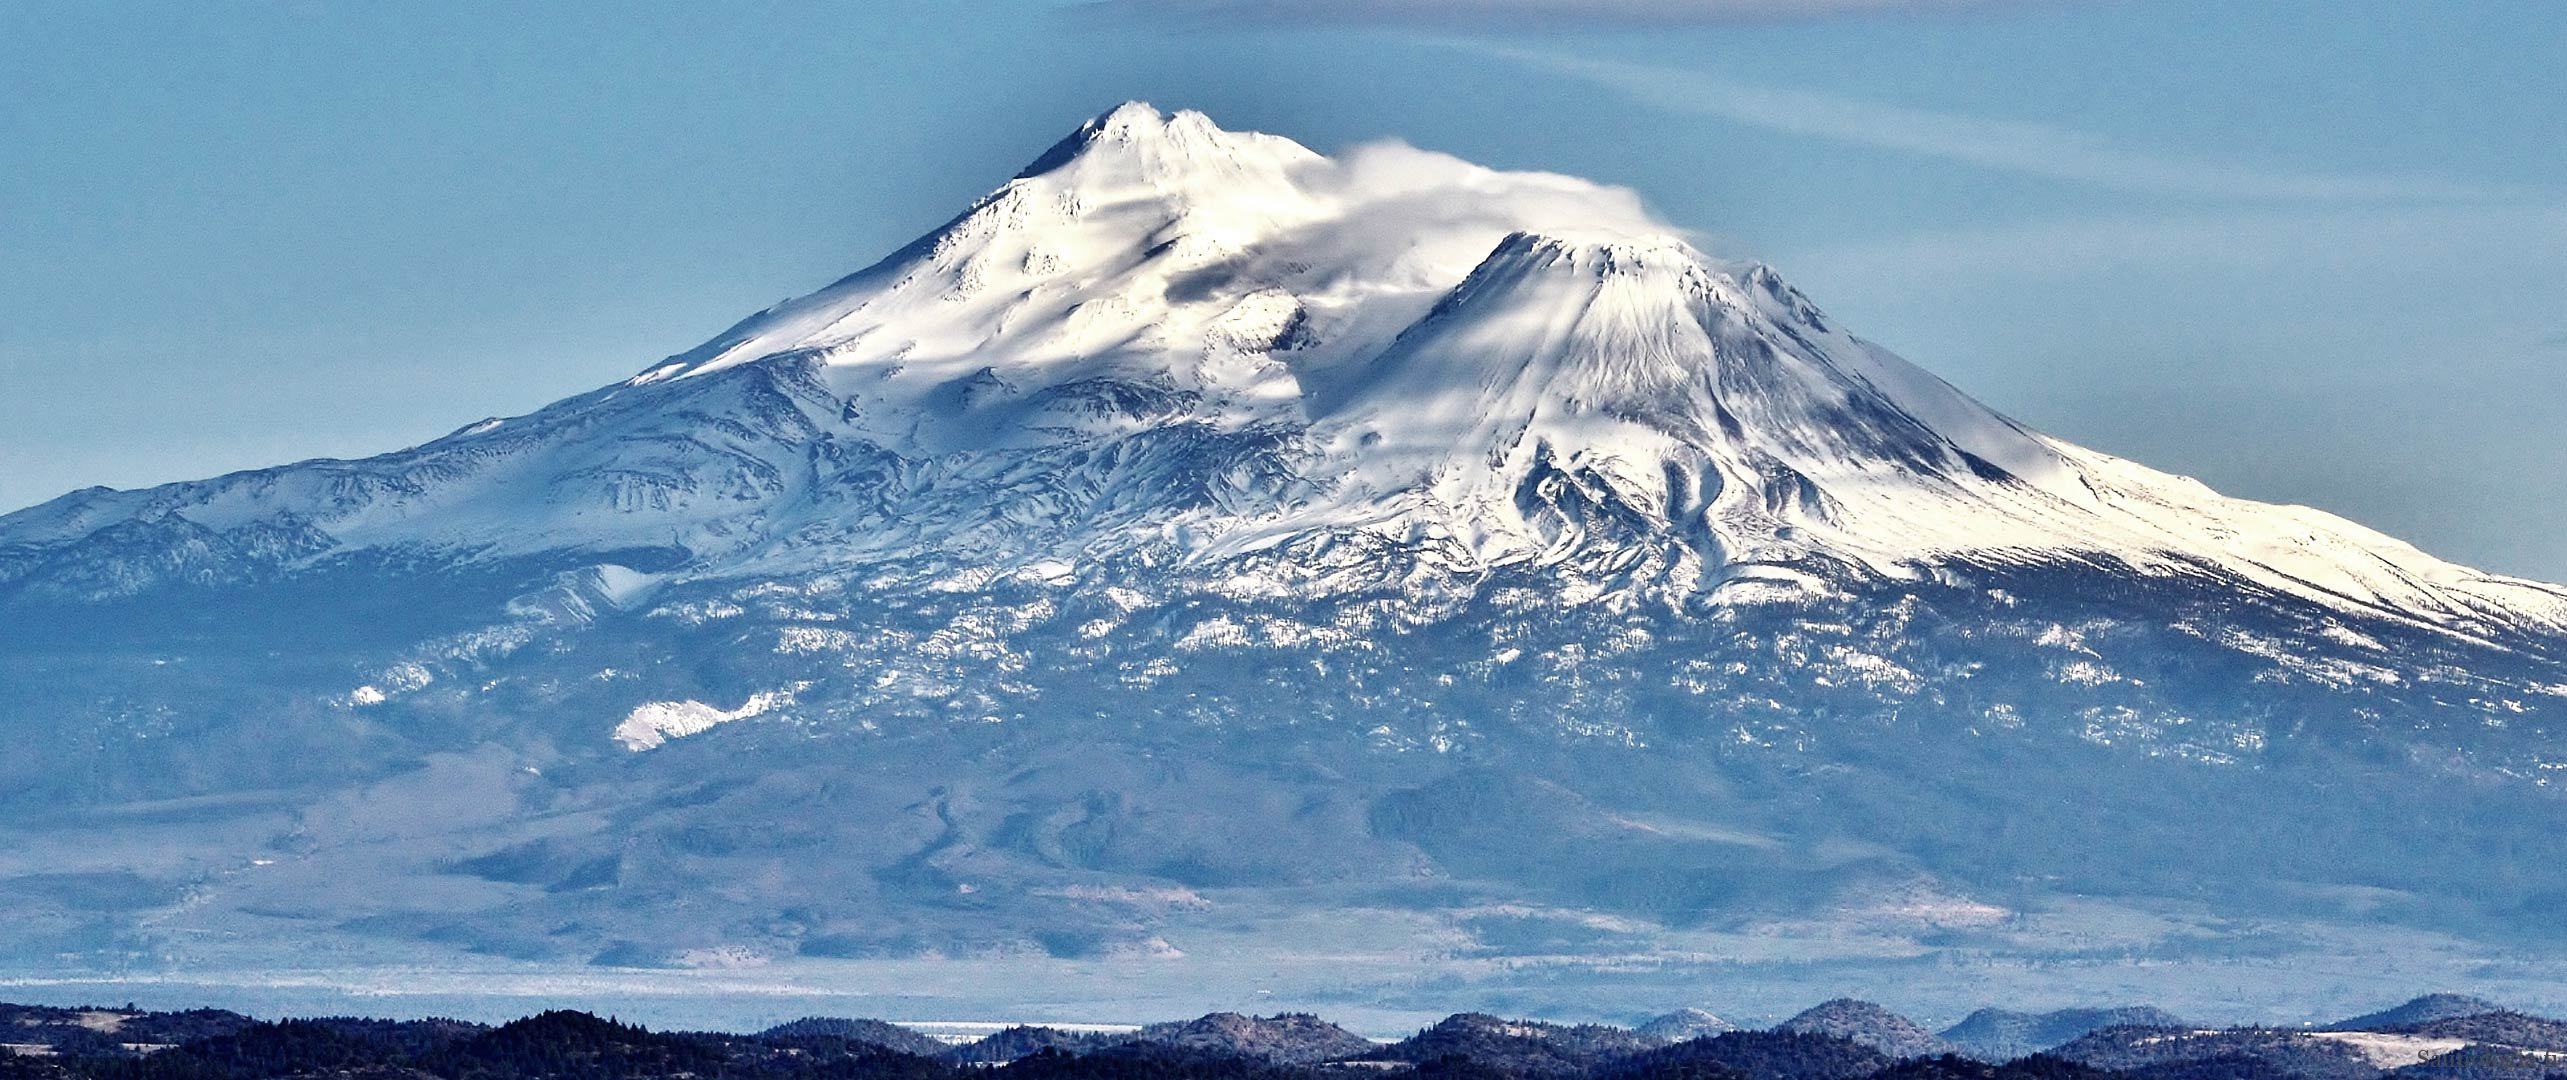 170908-Mt-Shasta-Panoramio-onste82